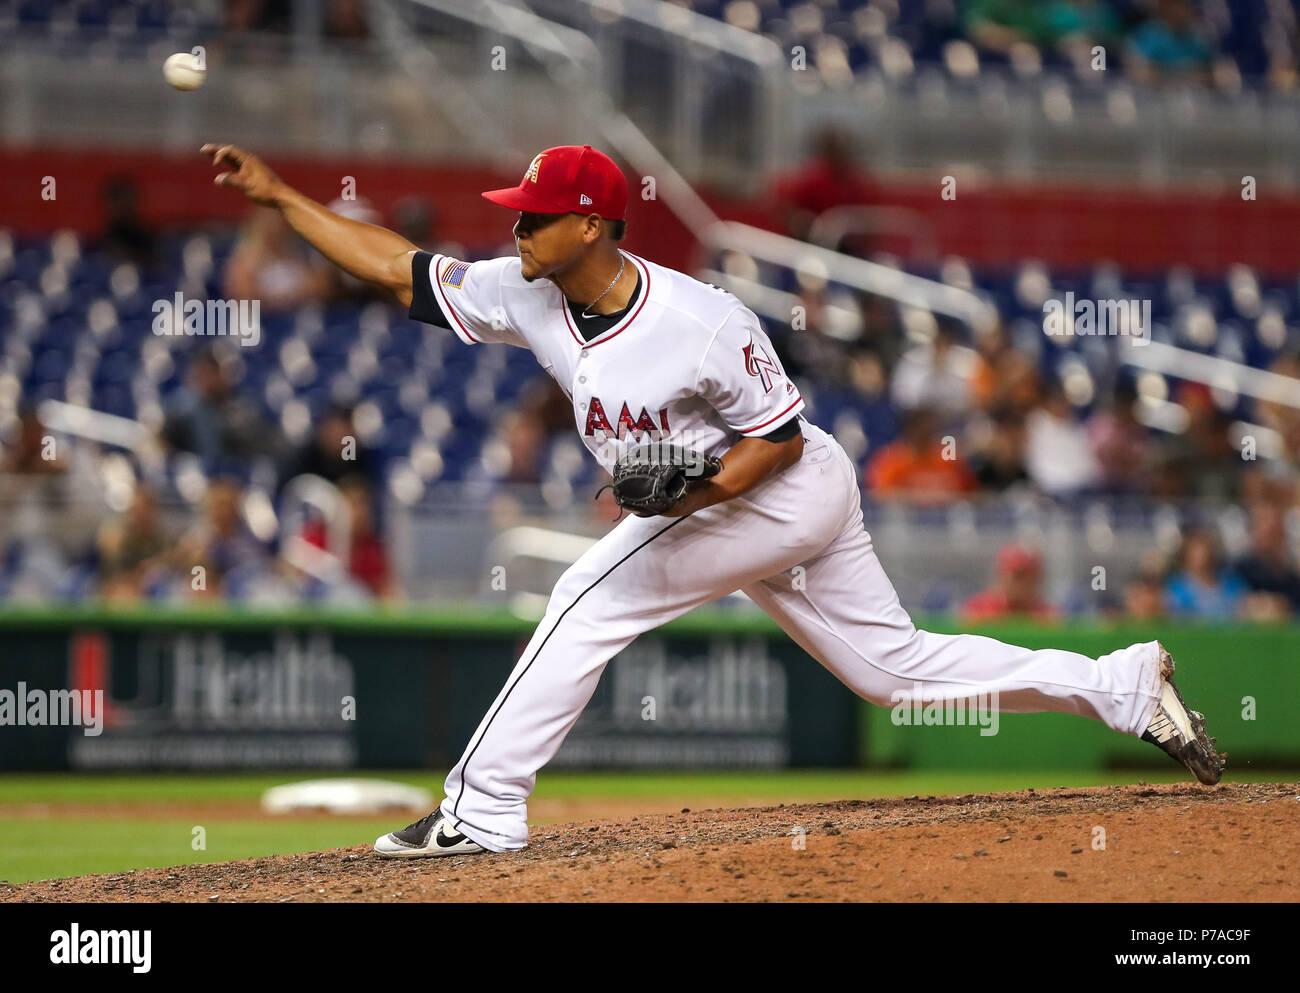 cheaper 64713 bd2b0 July 03, 2018: Miami Marlins pitcher Elieser Hernandez (57 ...